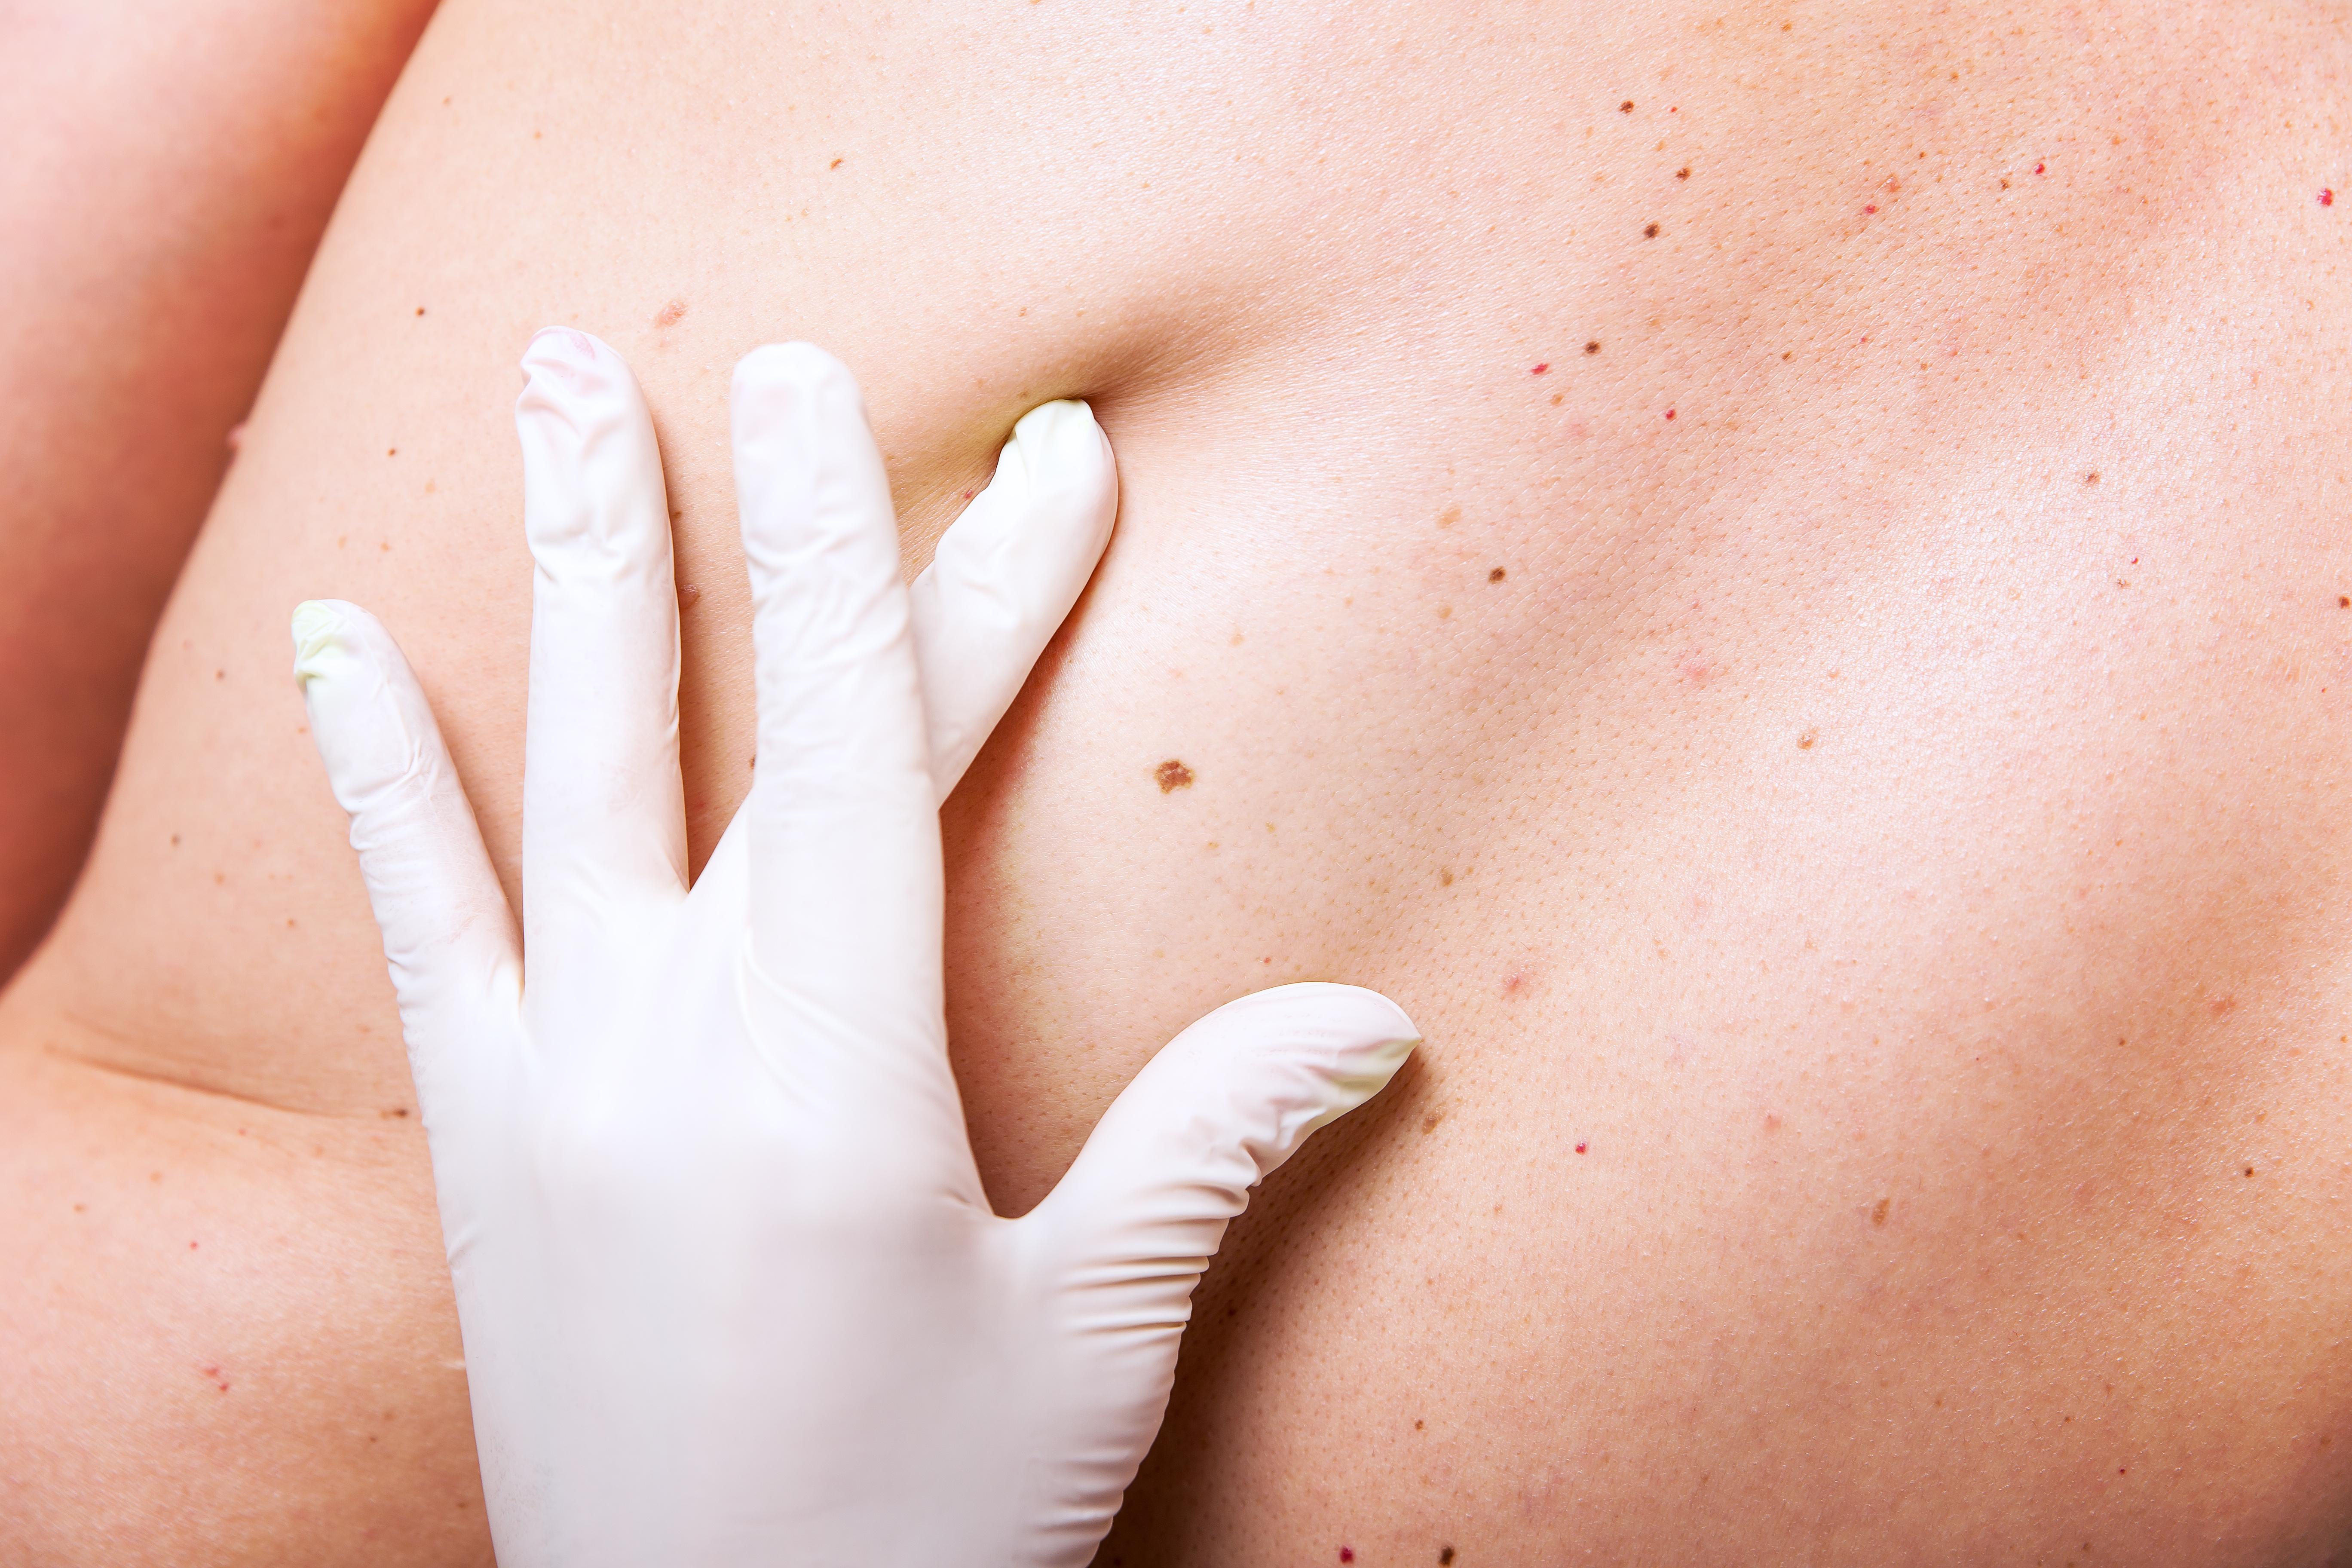 Advanced Dermatology to Host Skin Cancer Screening